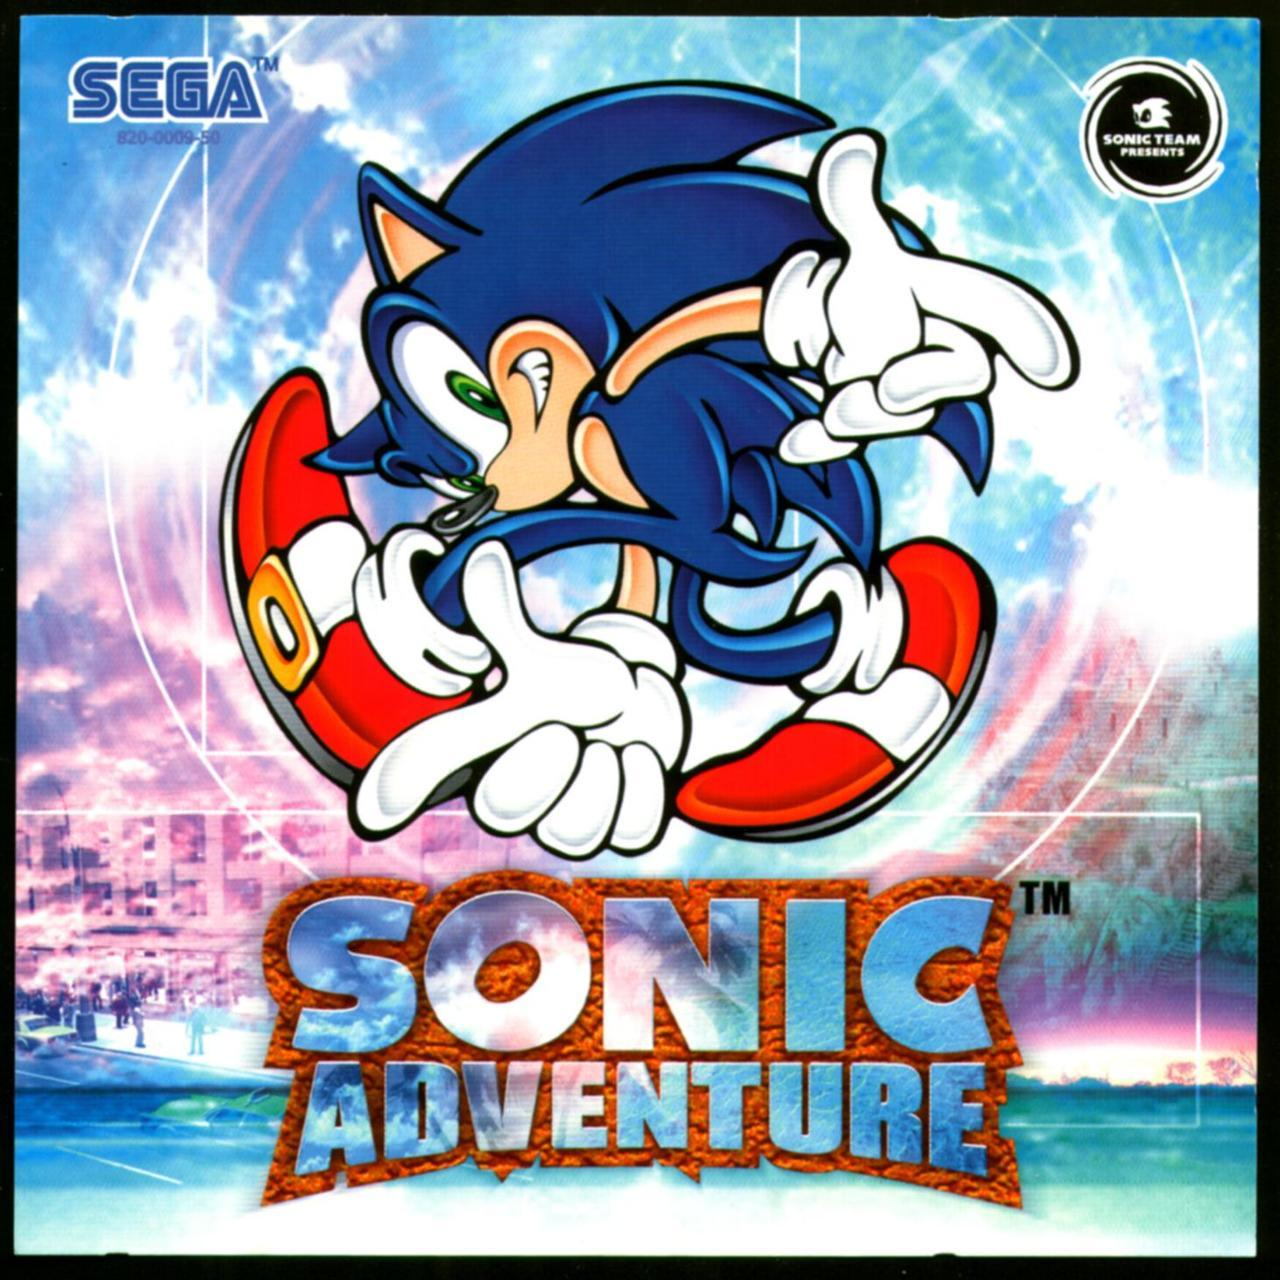 image sonic adventure 92012 1506500629 jpg sonic news network